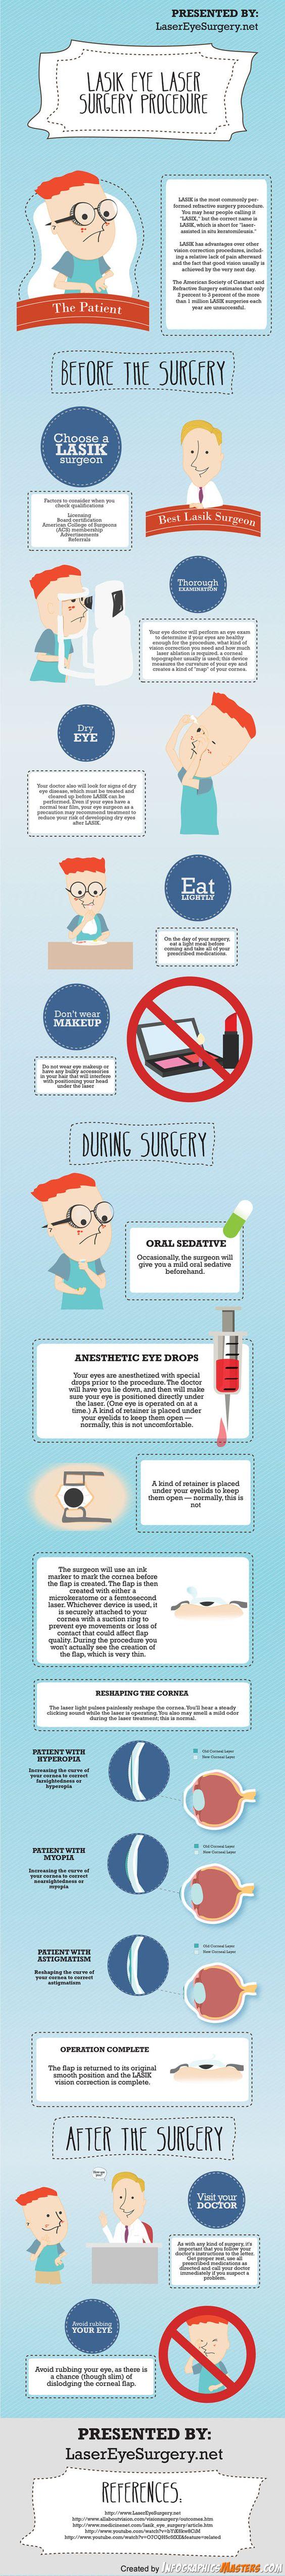 Lasik Eye Laser Surgery Procedure [Infographic]